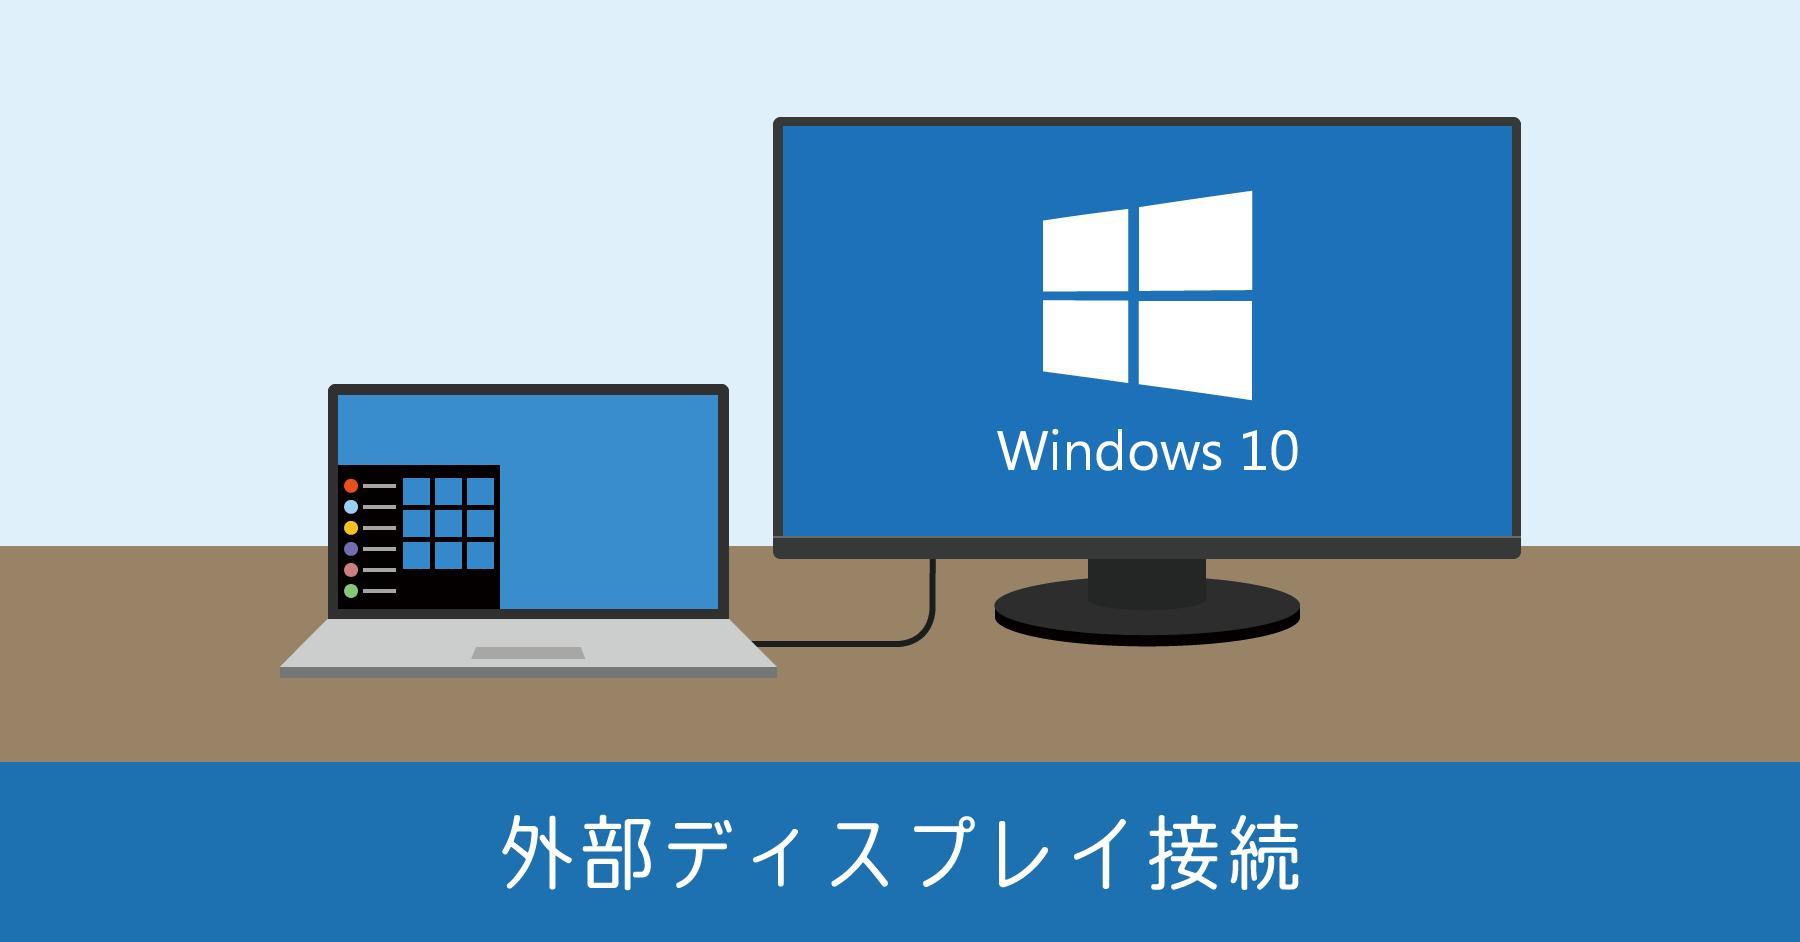 Windows 10 外部ディスプレイ接続方法